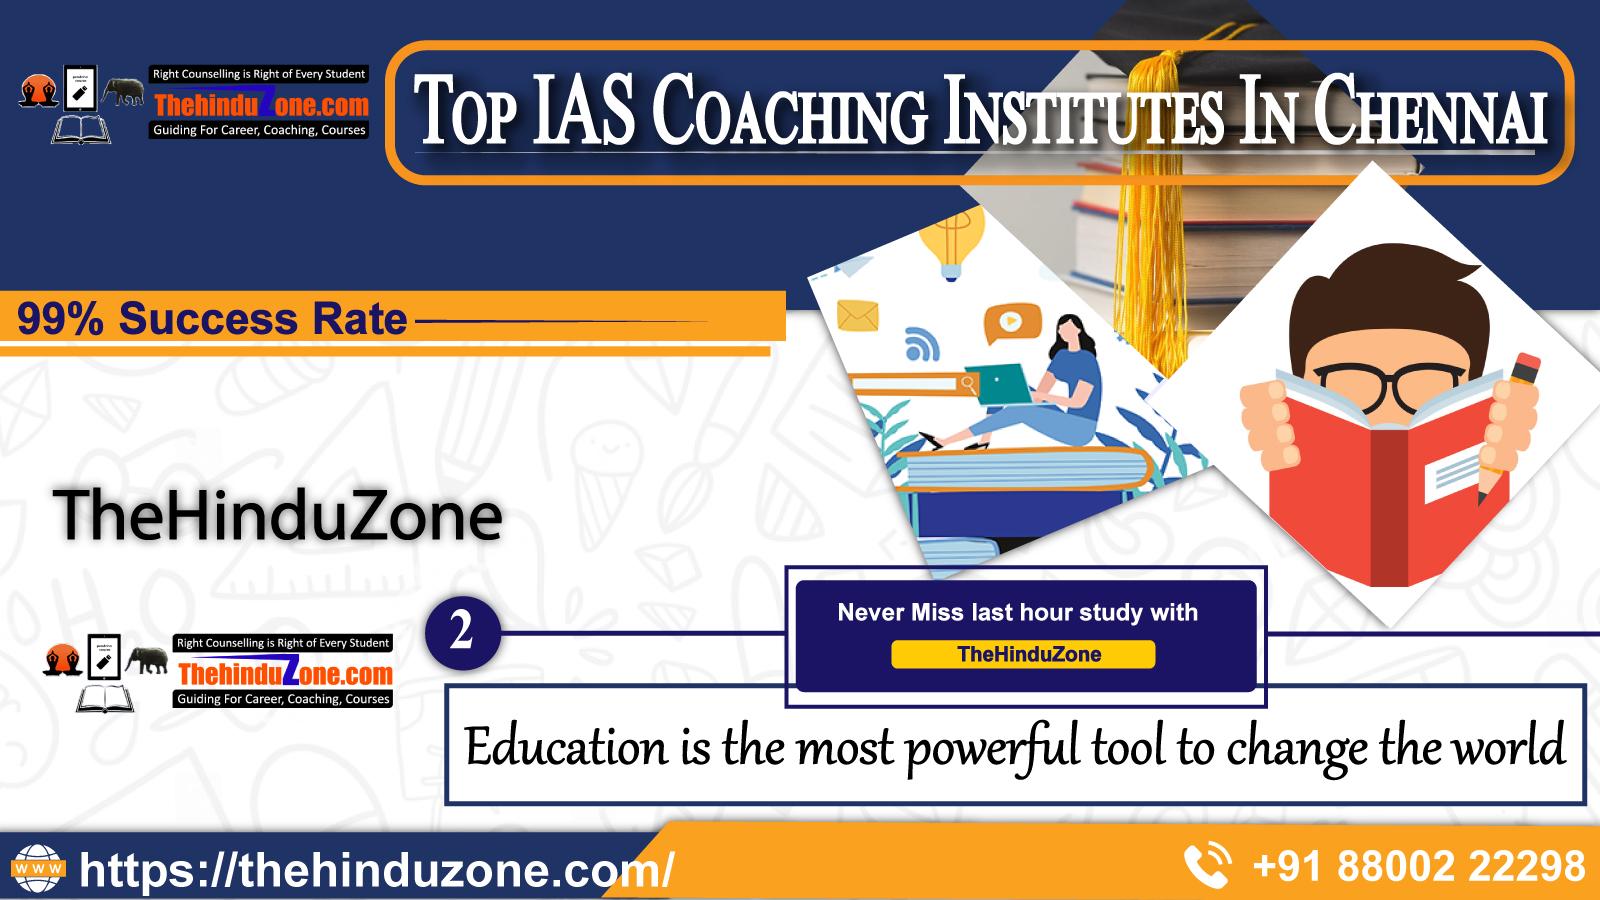 Thehinduzone ias coaching in chennai